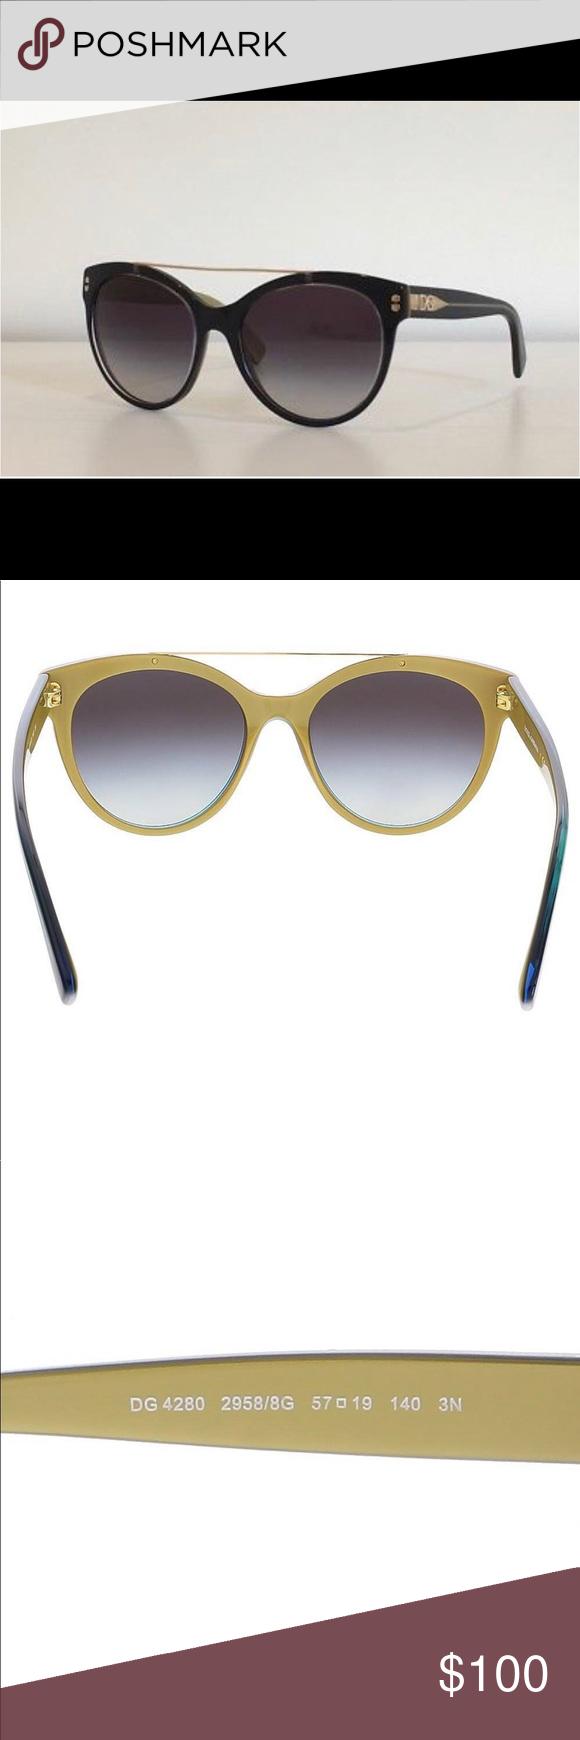 e27e28aad7c0 Dolce   Gabbana DG 4280 Black Cat Eye Sunglasses Dolce   Gabbana Black    Gold Cat